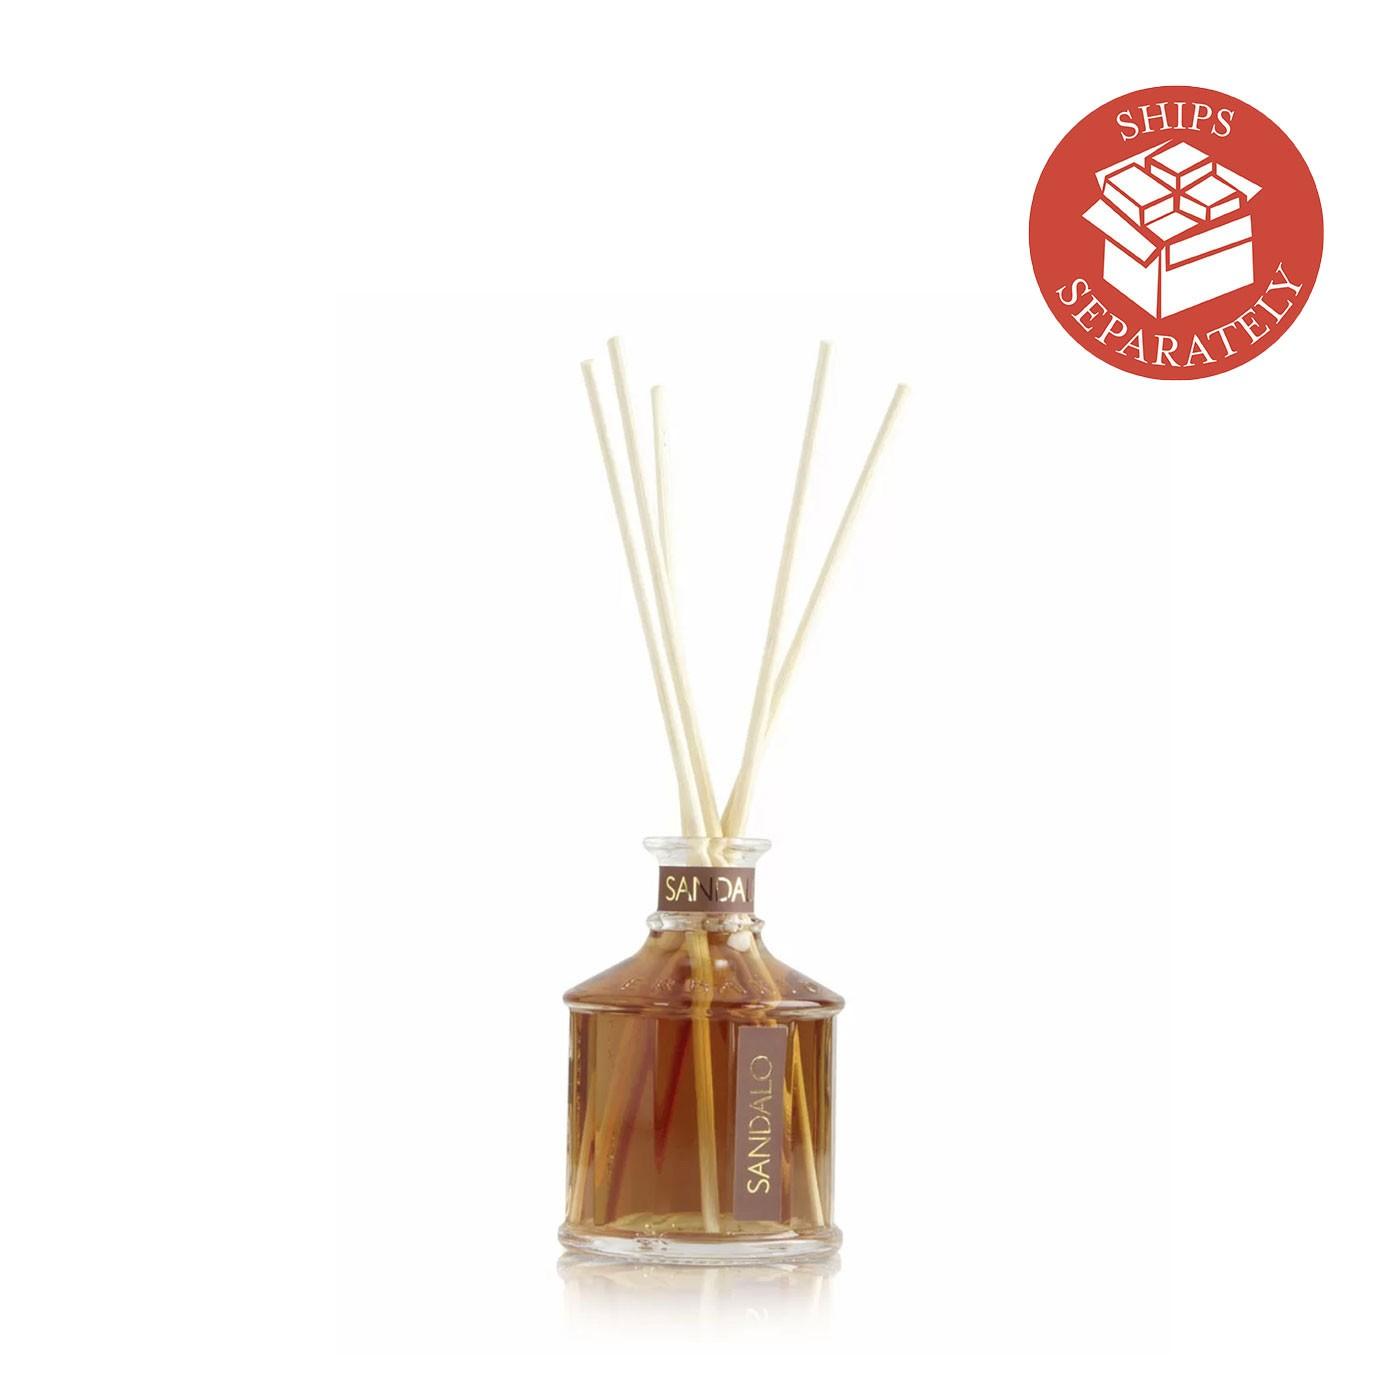 Sandalwood Fragrance Diffuser 8.4 oz - Erbario Toscano | Eataly.com